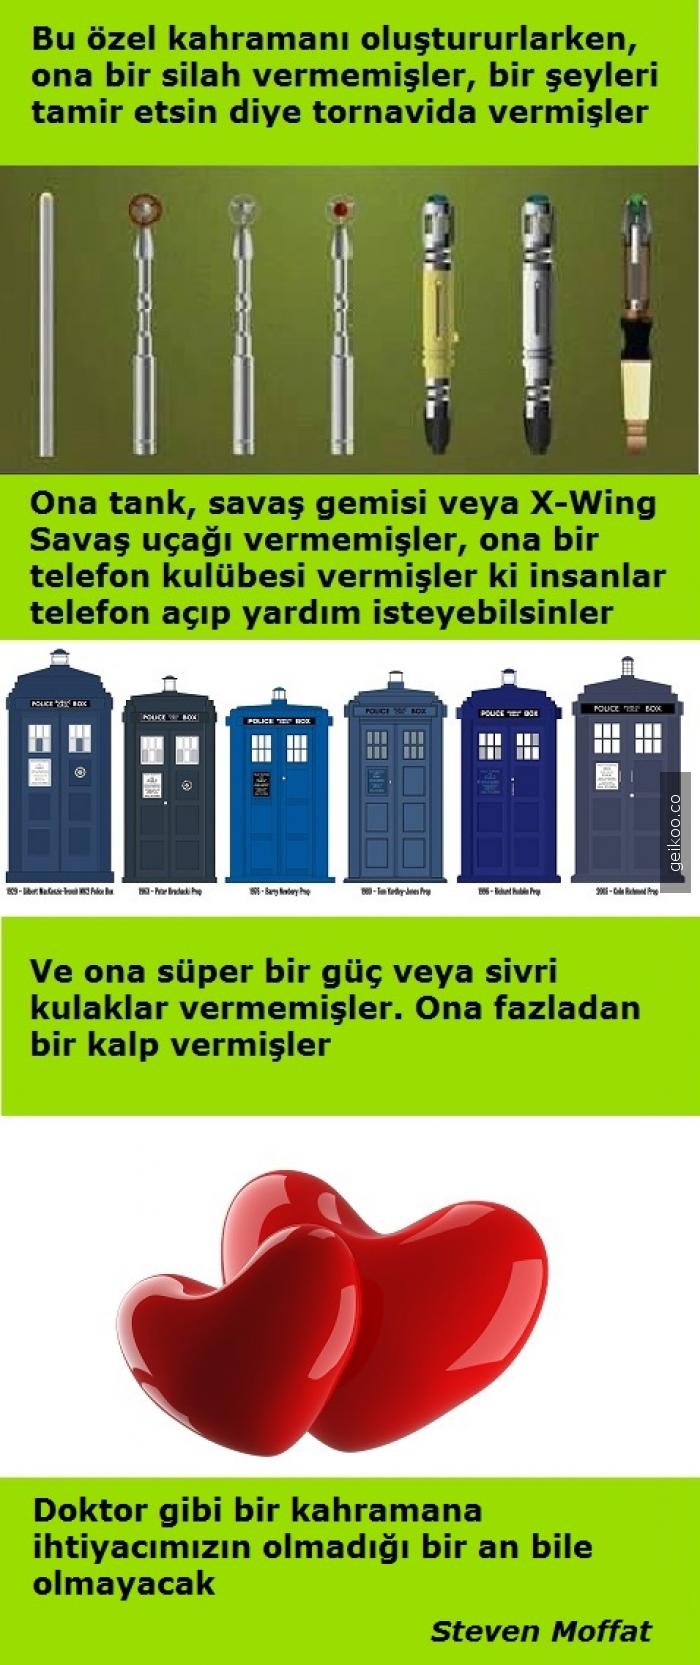 Doctor Who'nun temeli